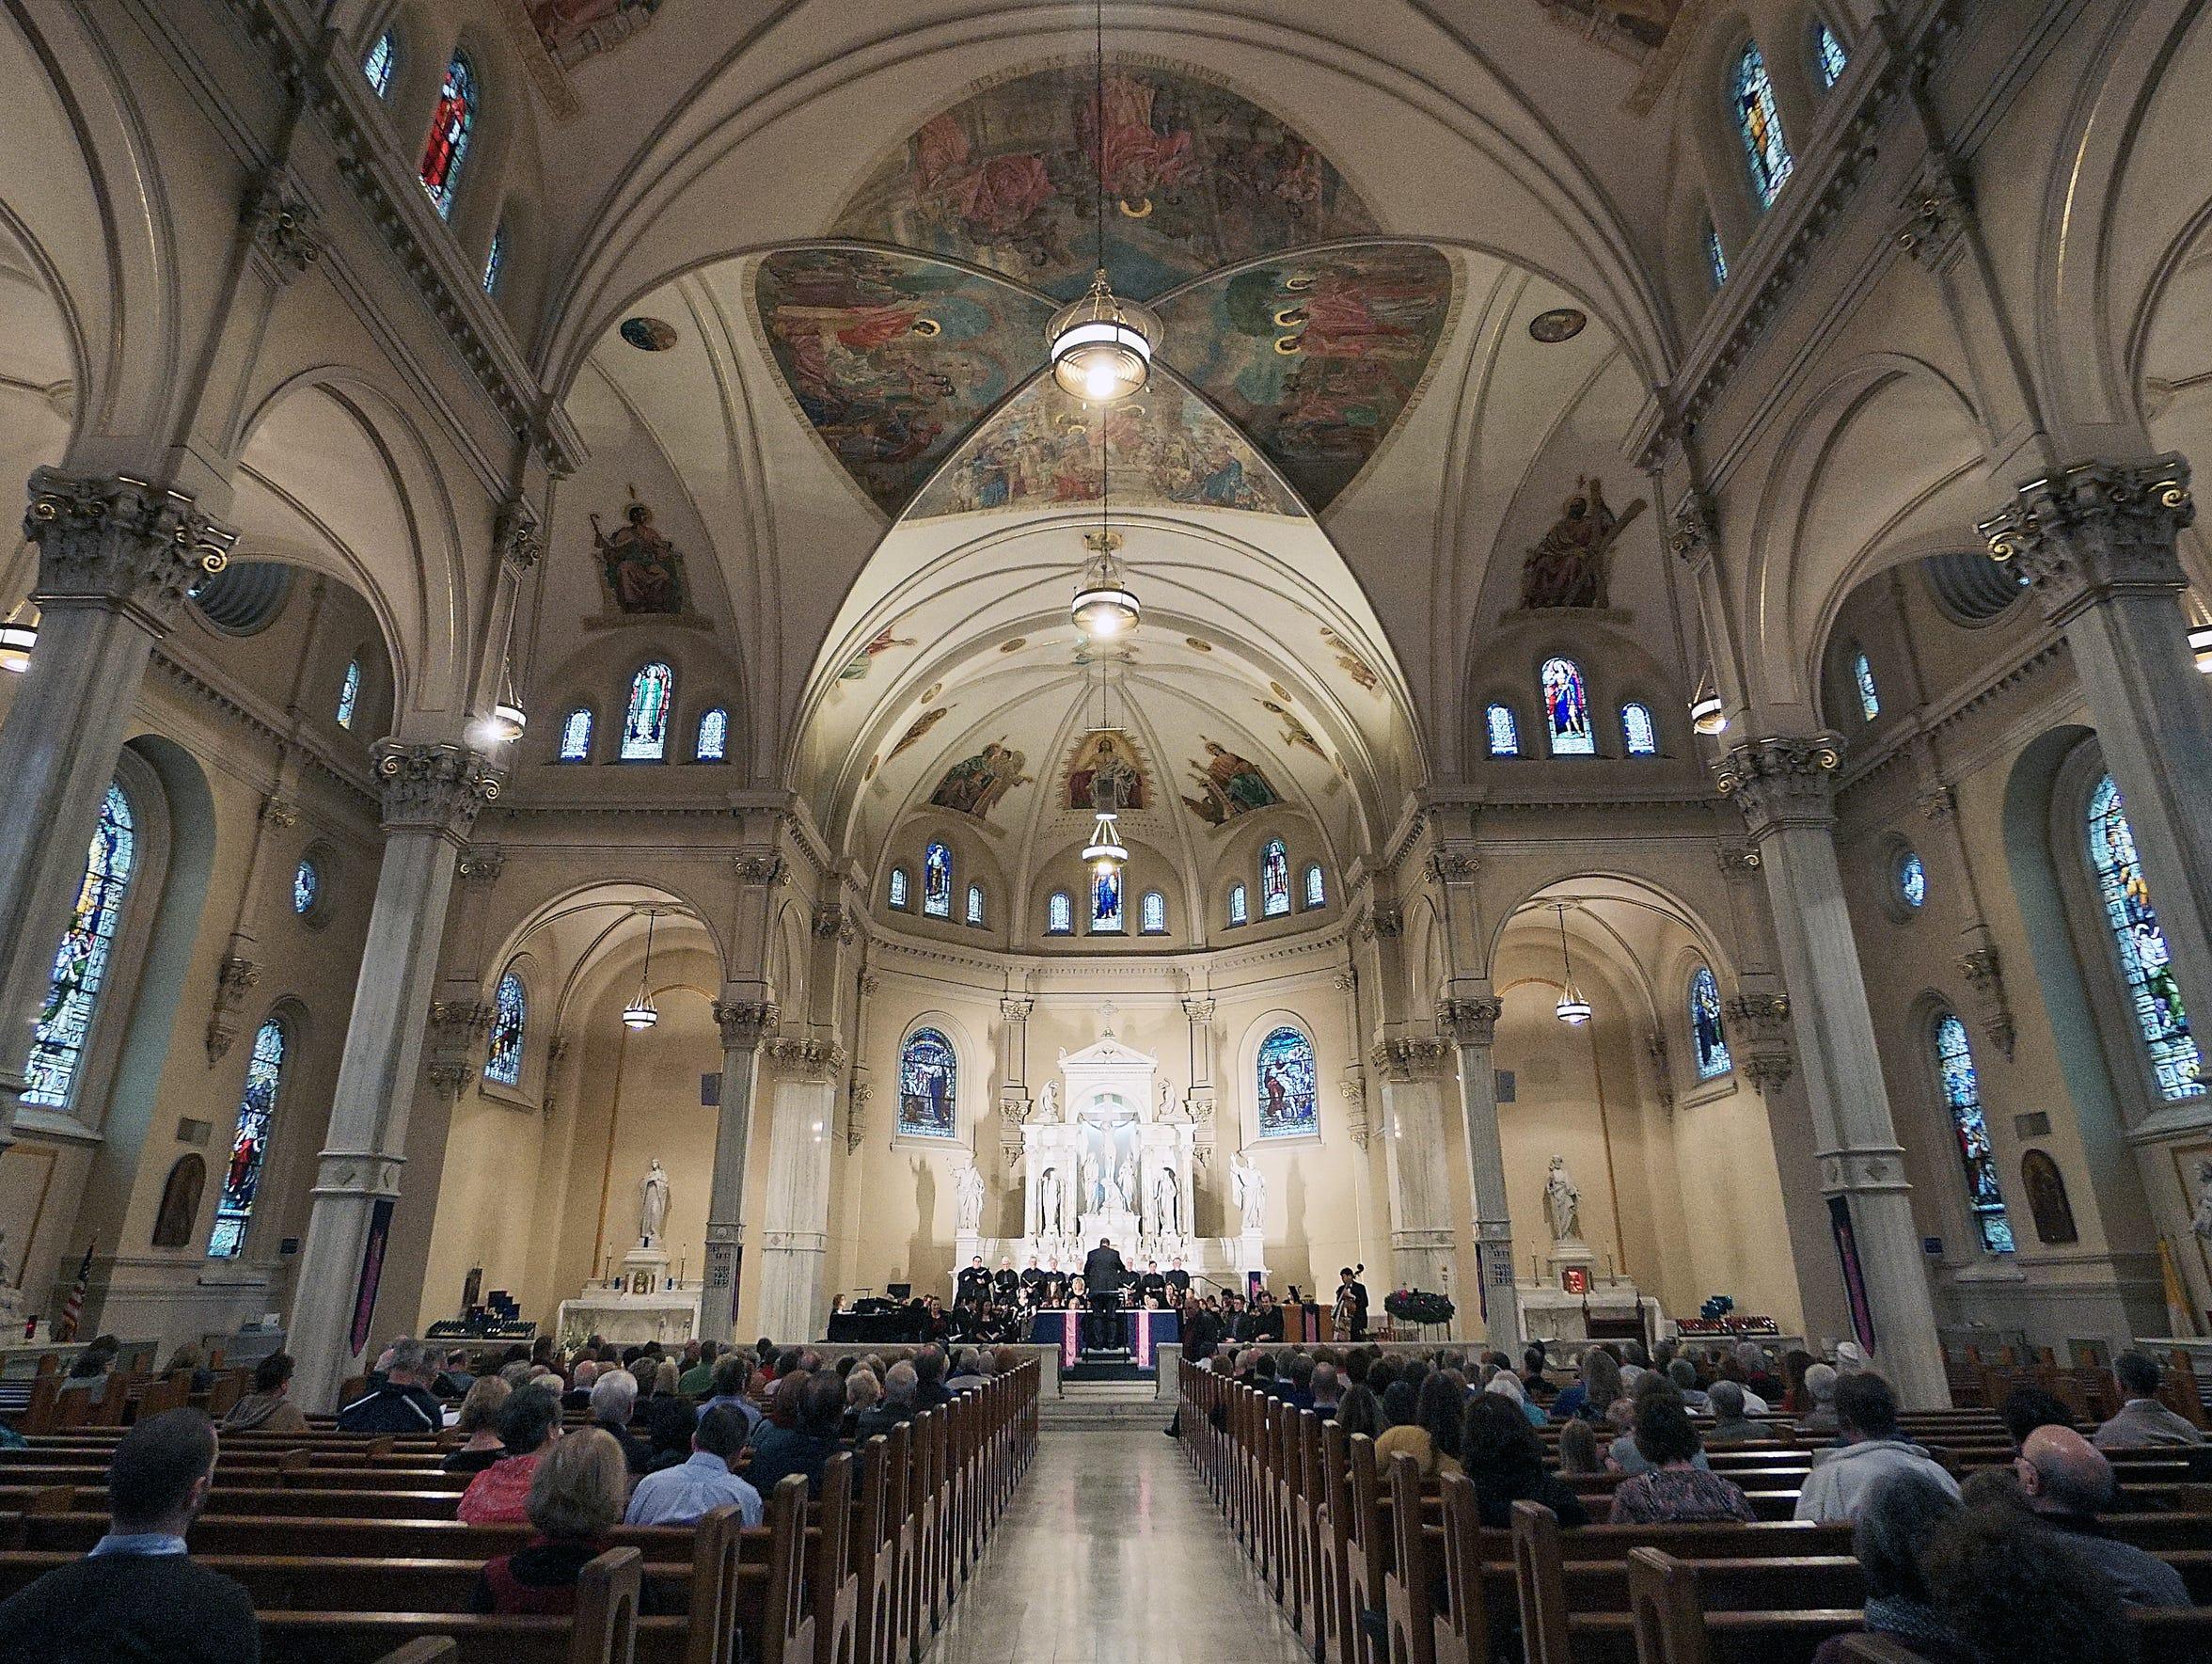 People gather at St. Peter's Catholic Church on Sunday